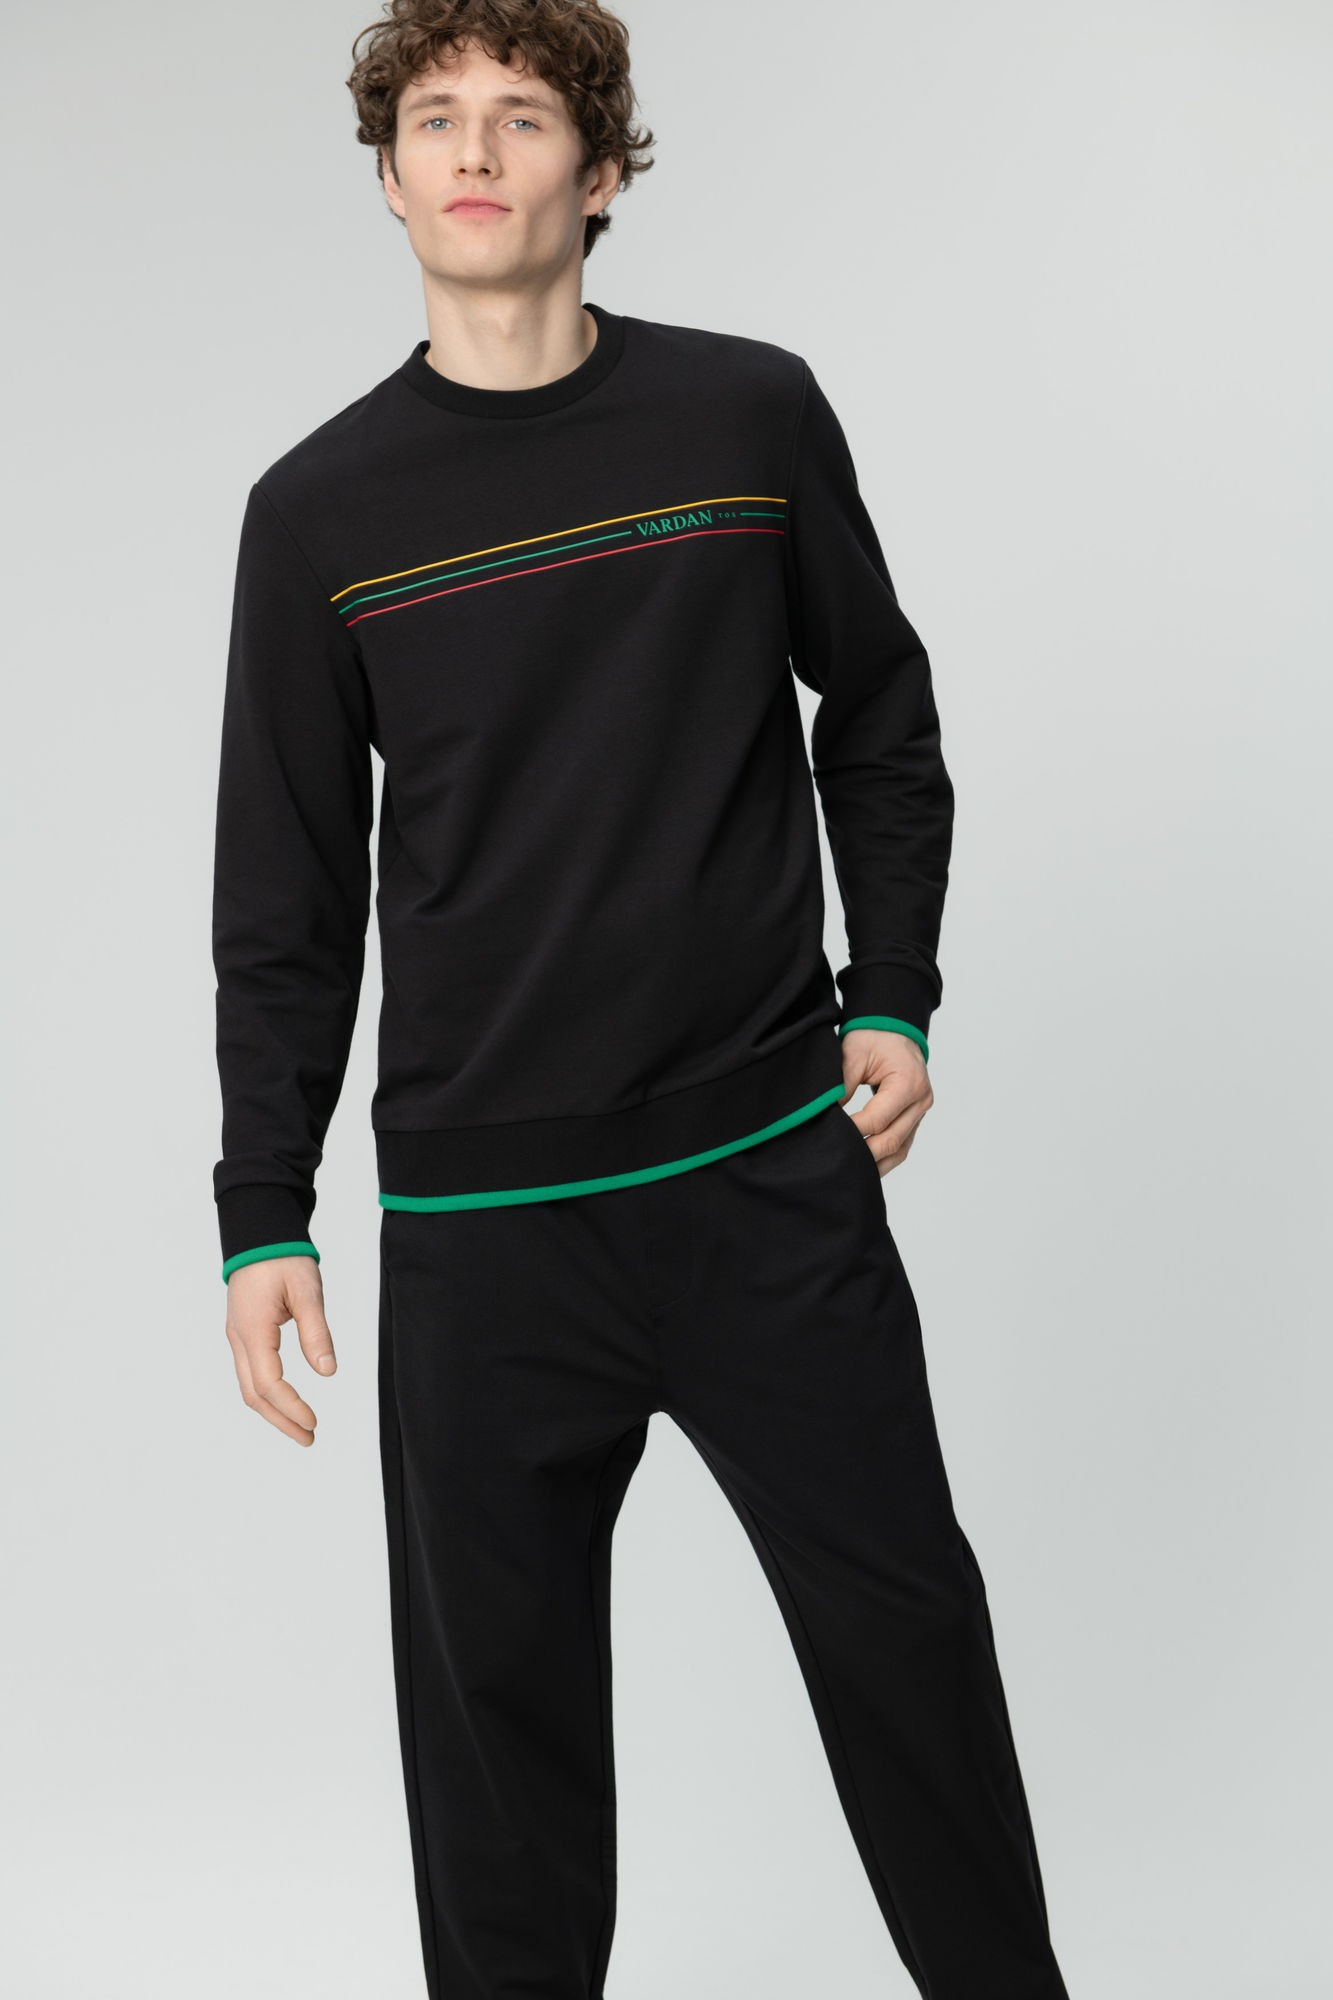 AUDIMAS Medvilnės TERRY trikotažo džemp. 20LT-409 Black M